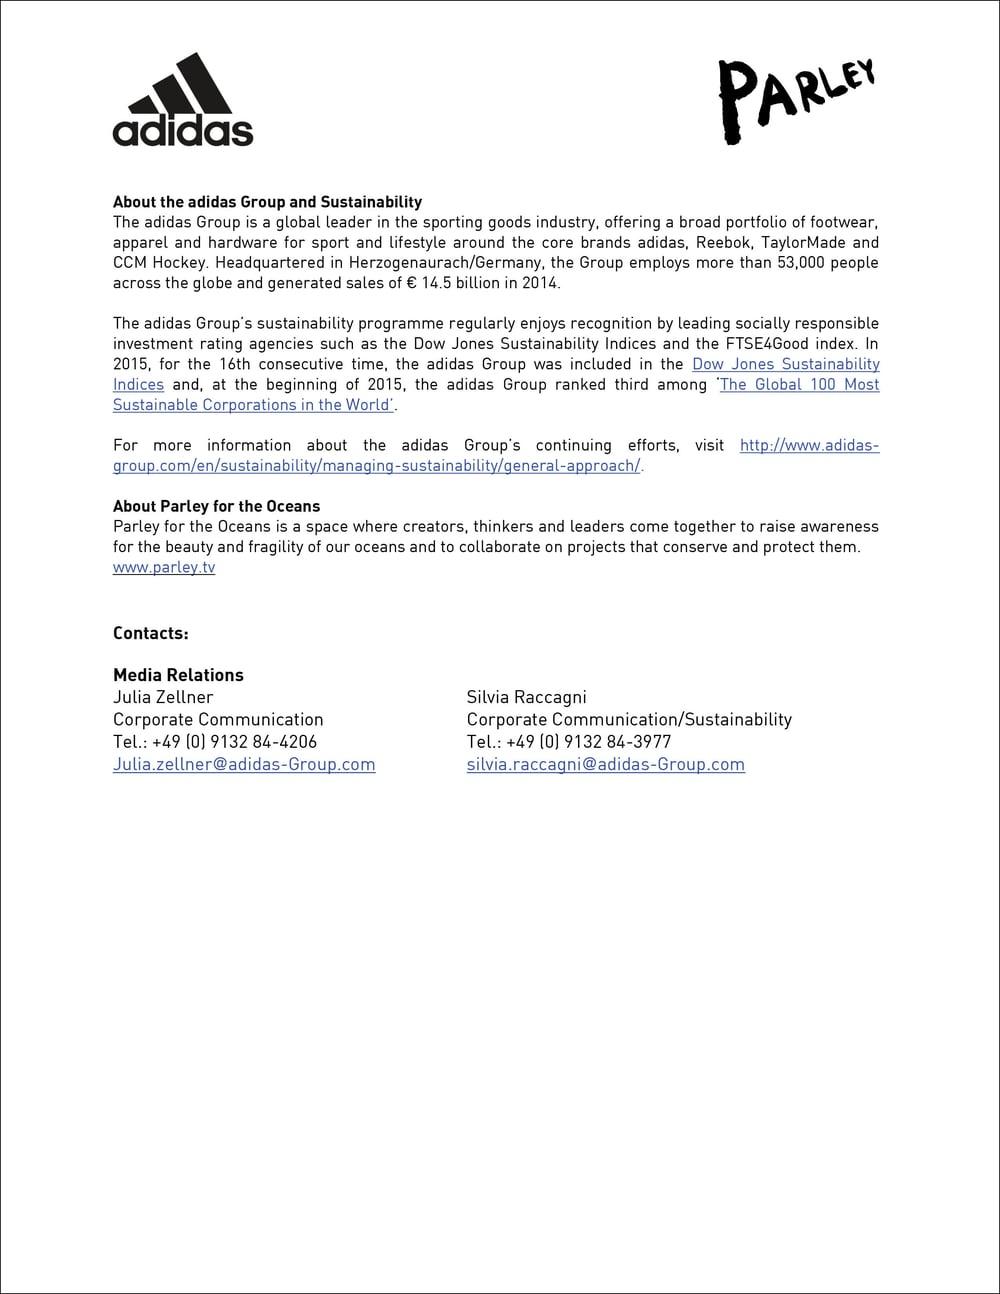 Parley Adidas COP21 Press Release3.jpg